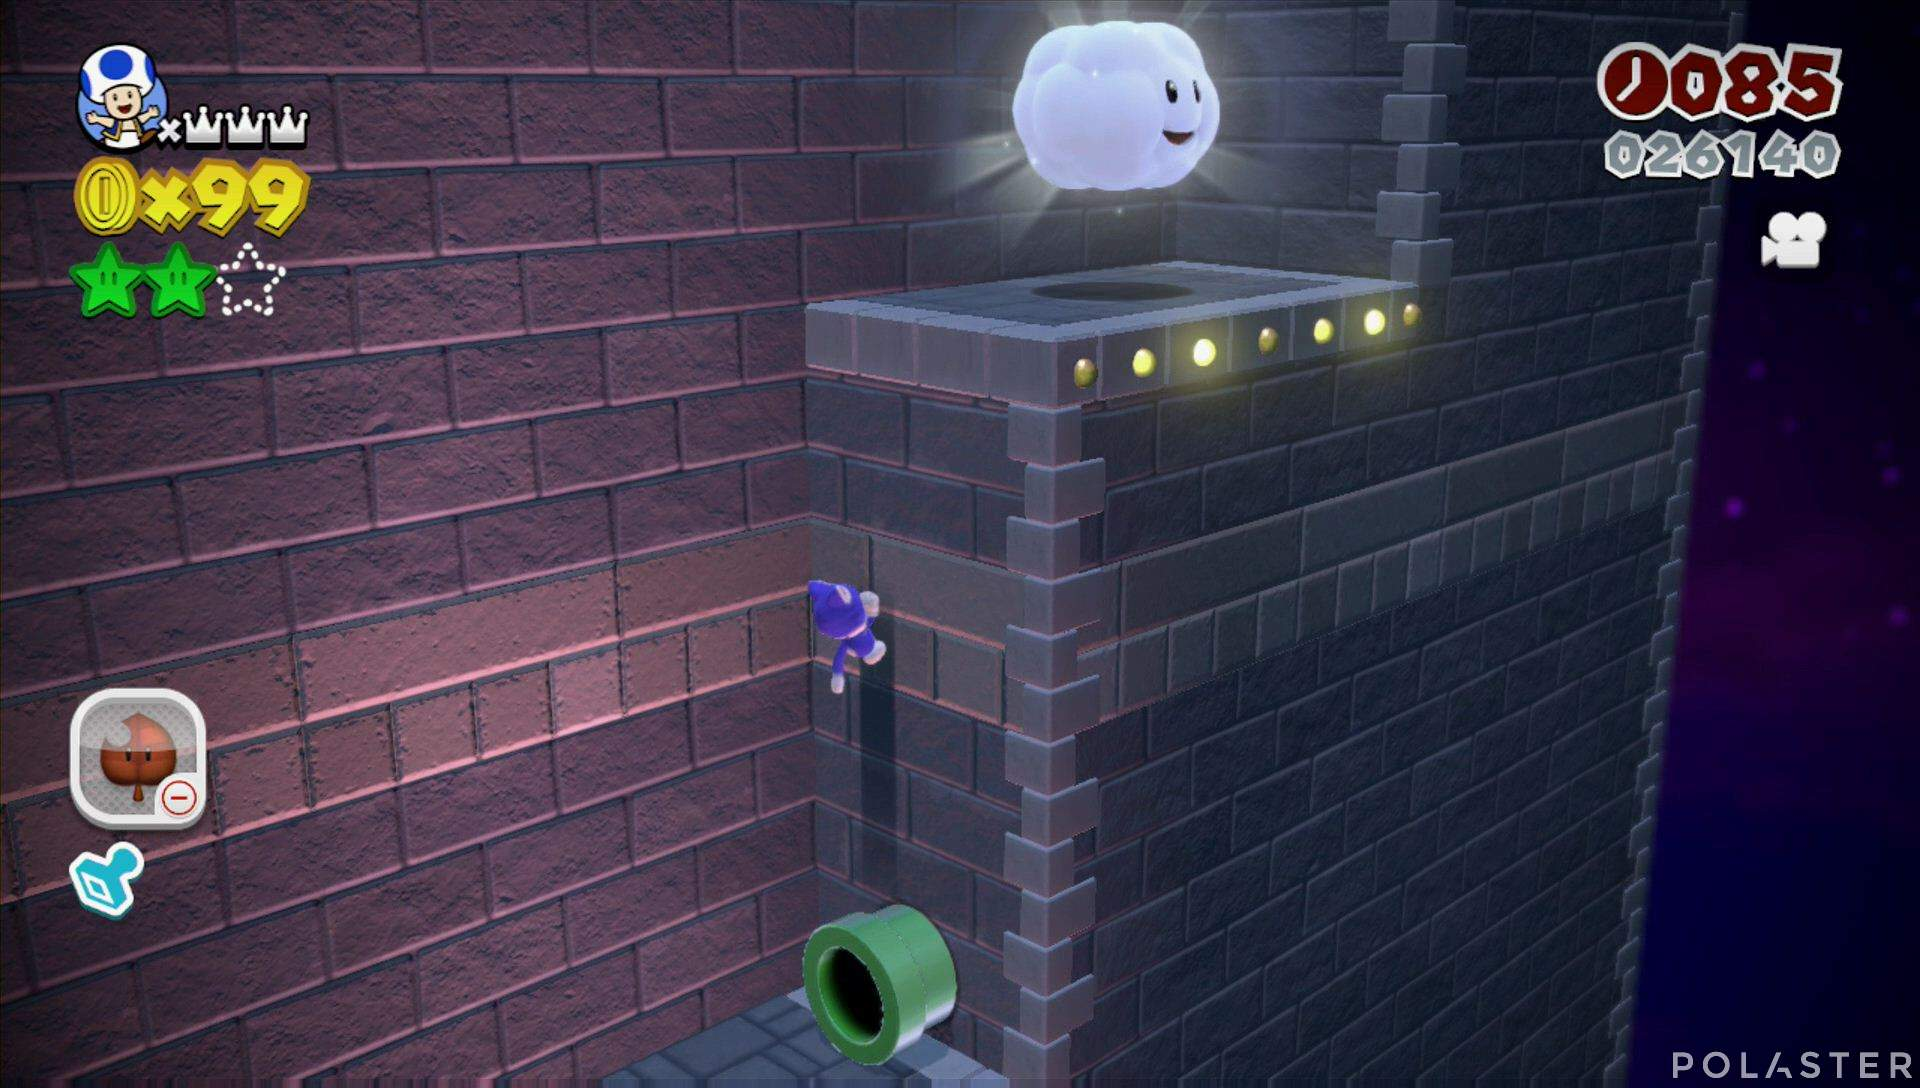 Super Mario 3D World Mundo Bowser-5 Estrella 3